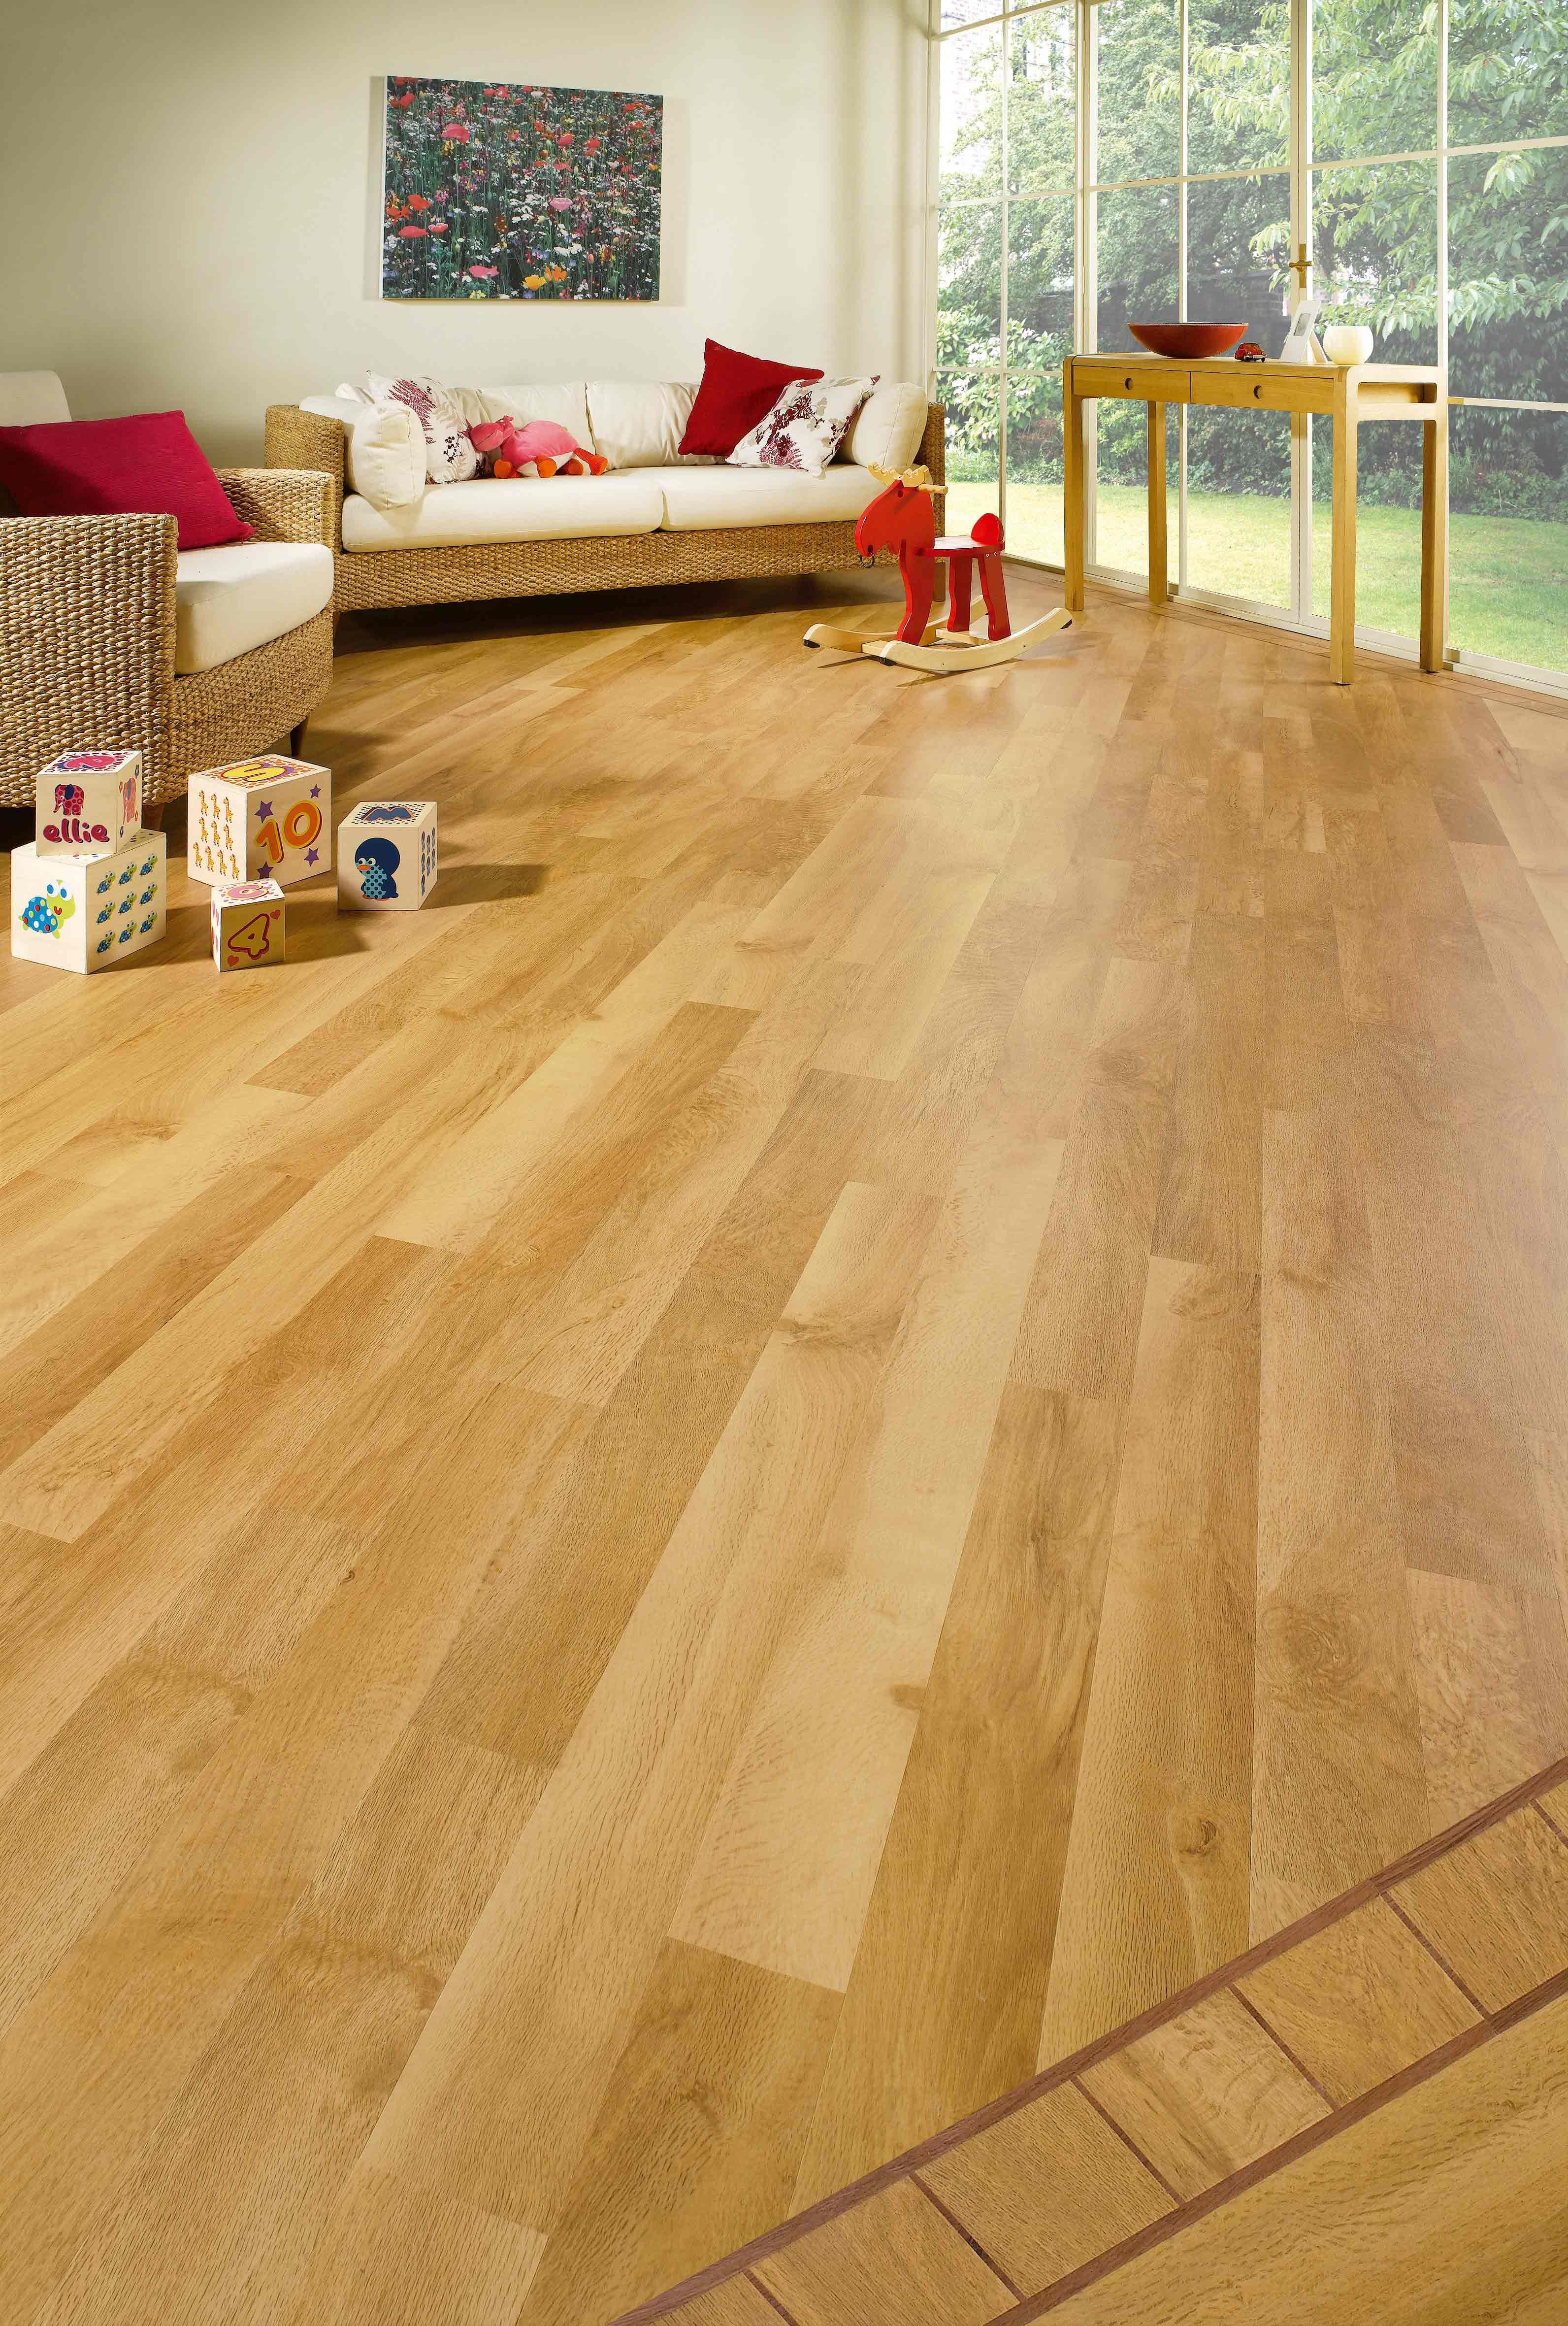 knight tile karndean design flooring vinyl flooring luxury vinyl plank